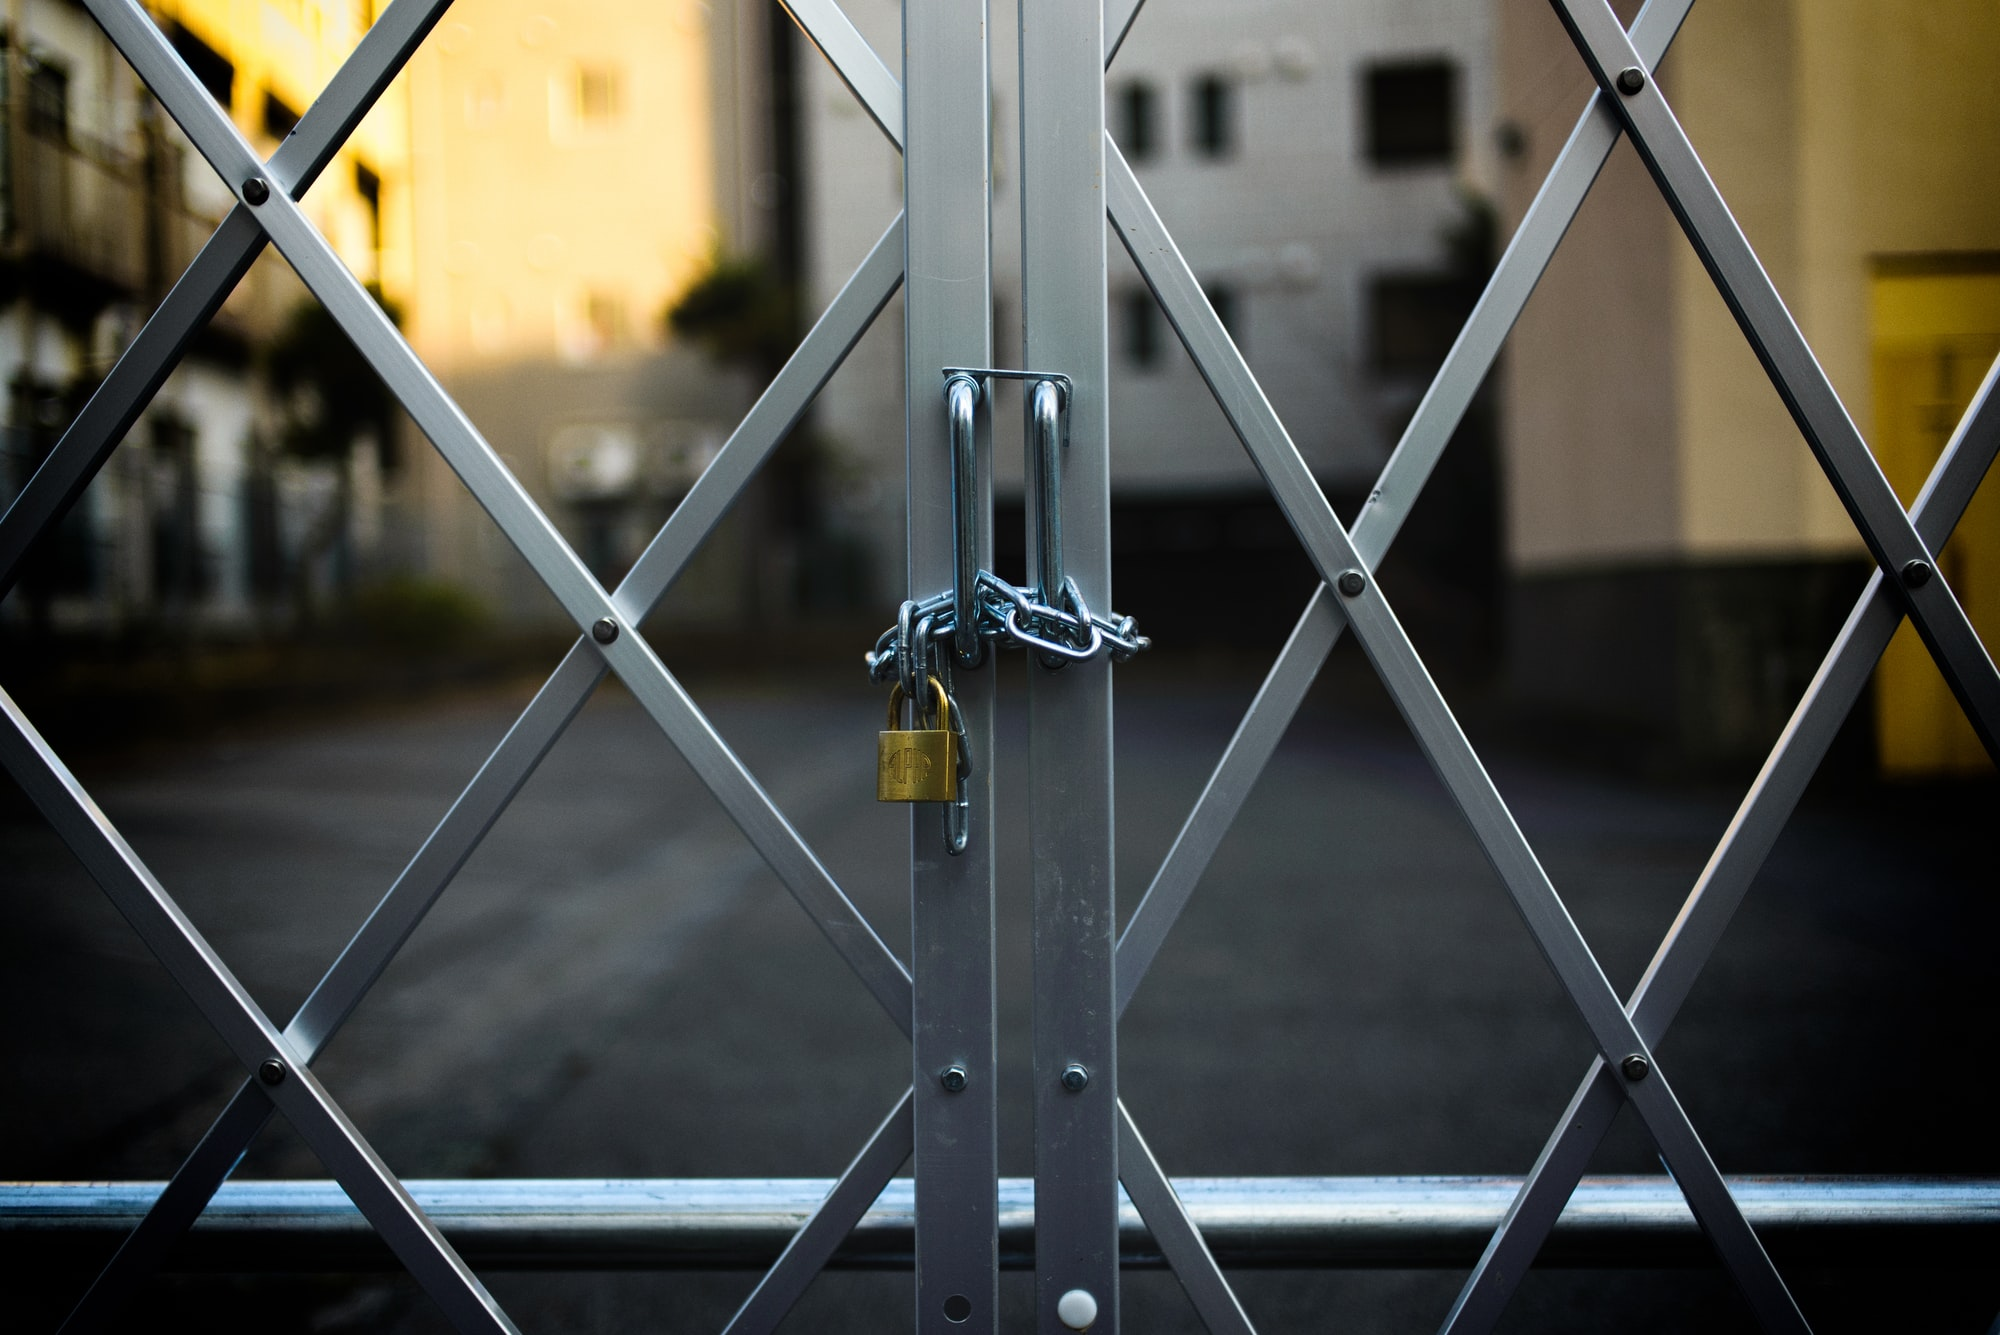 DNS Privacy Tanpa VPN untuk Chrome, Firefox, dan Android